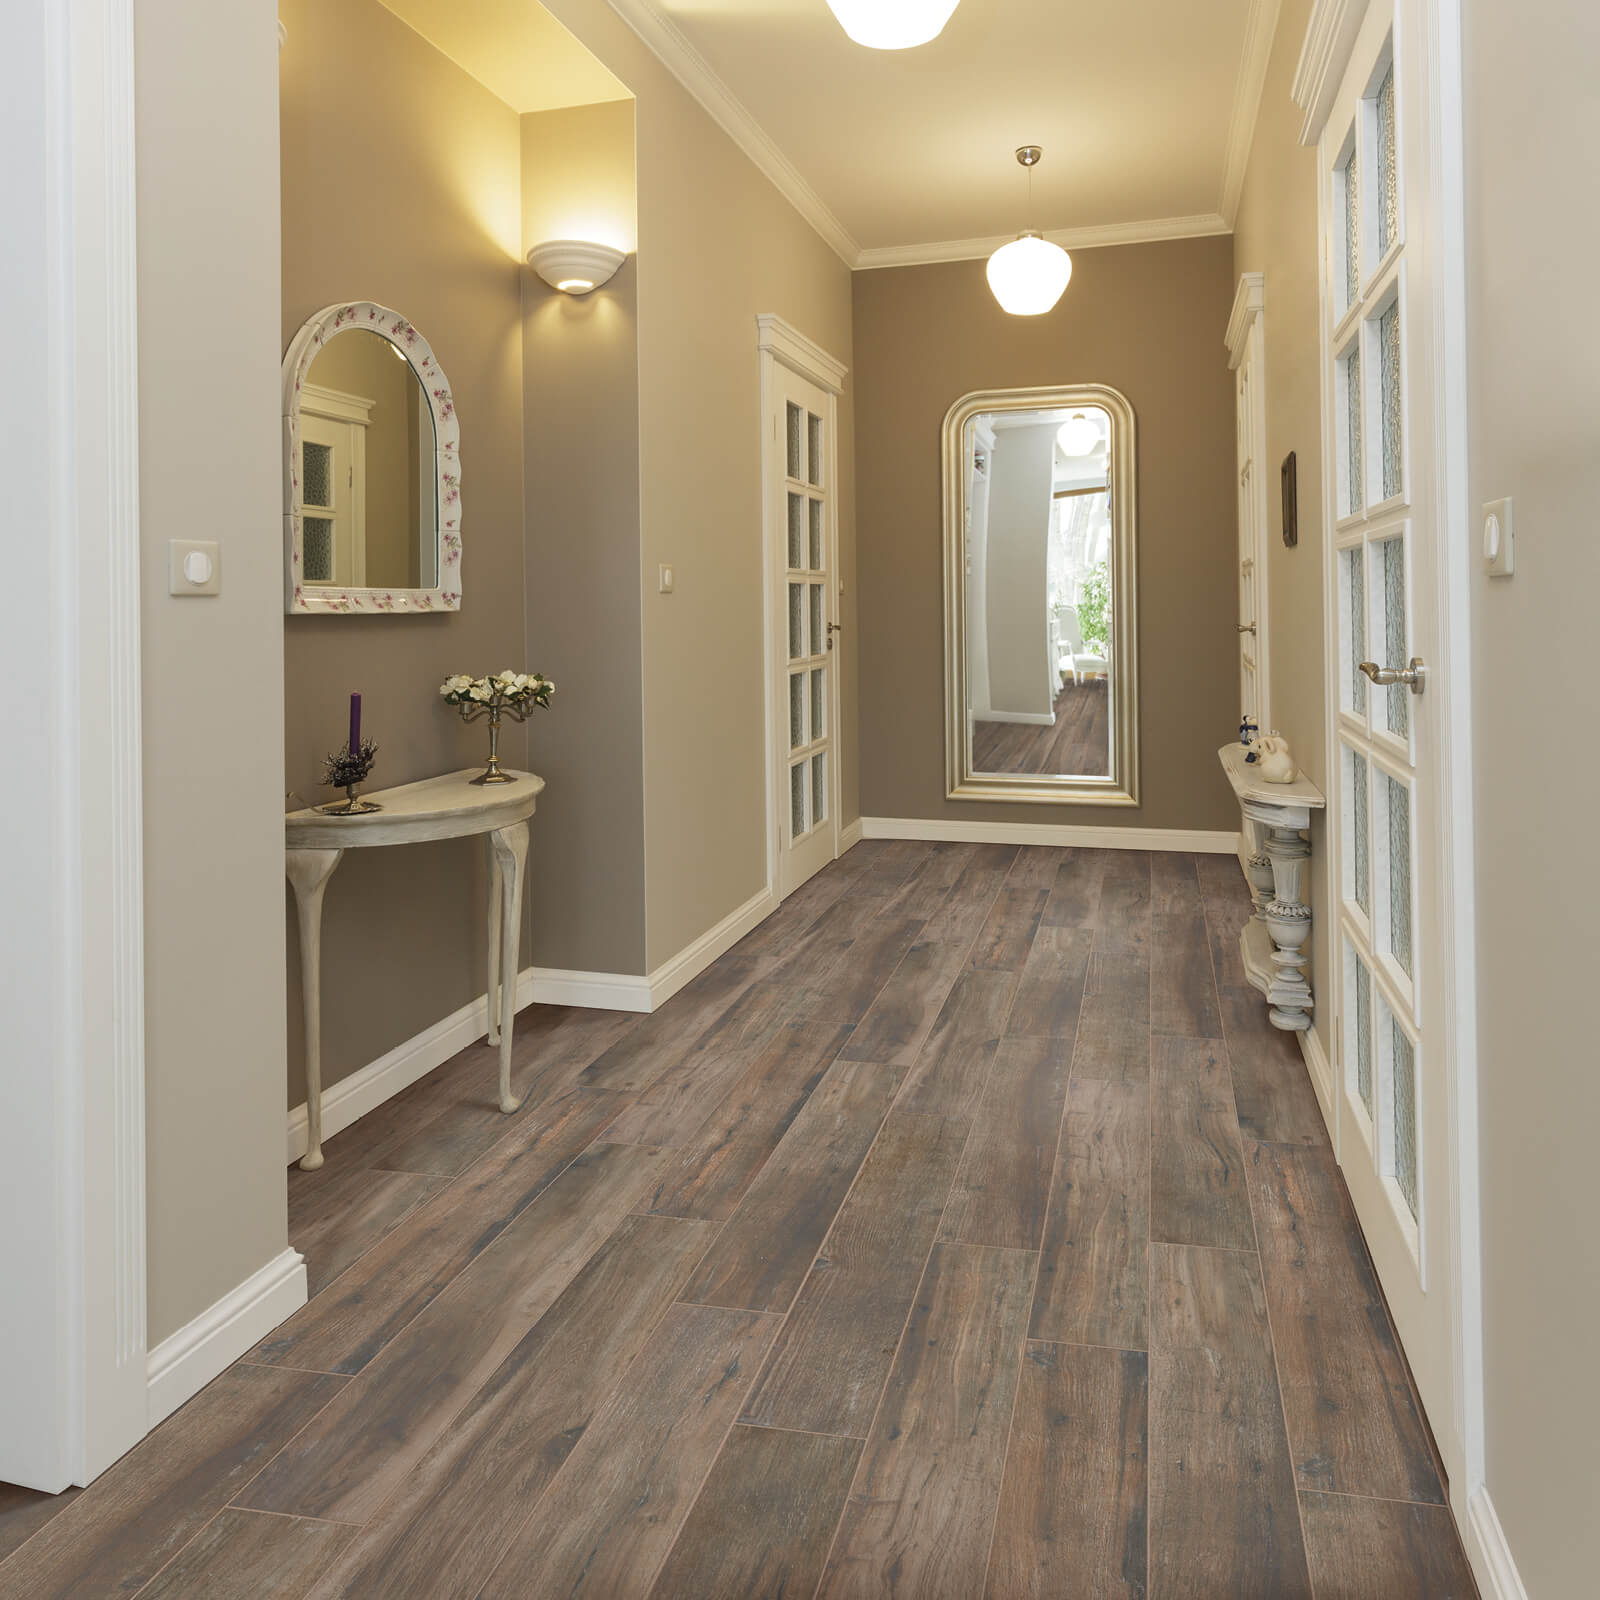 Tile Flooring   Haley's Flooring & Interiors